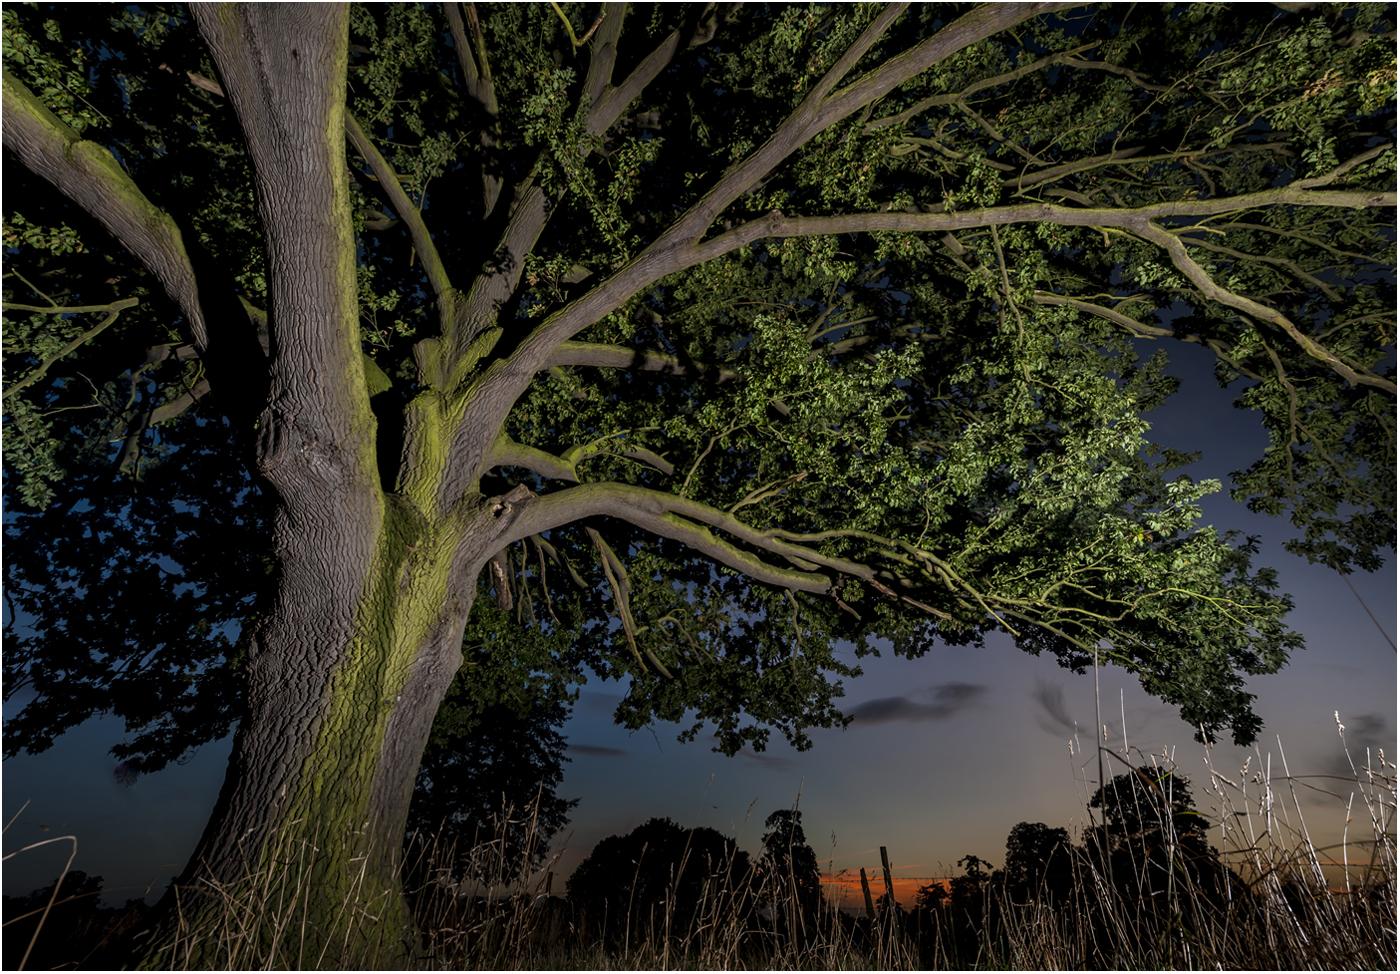 OAK TREE AT DUSK by Jerry Lake.jpg